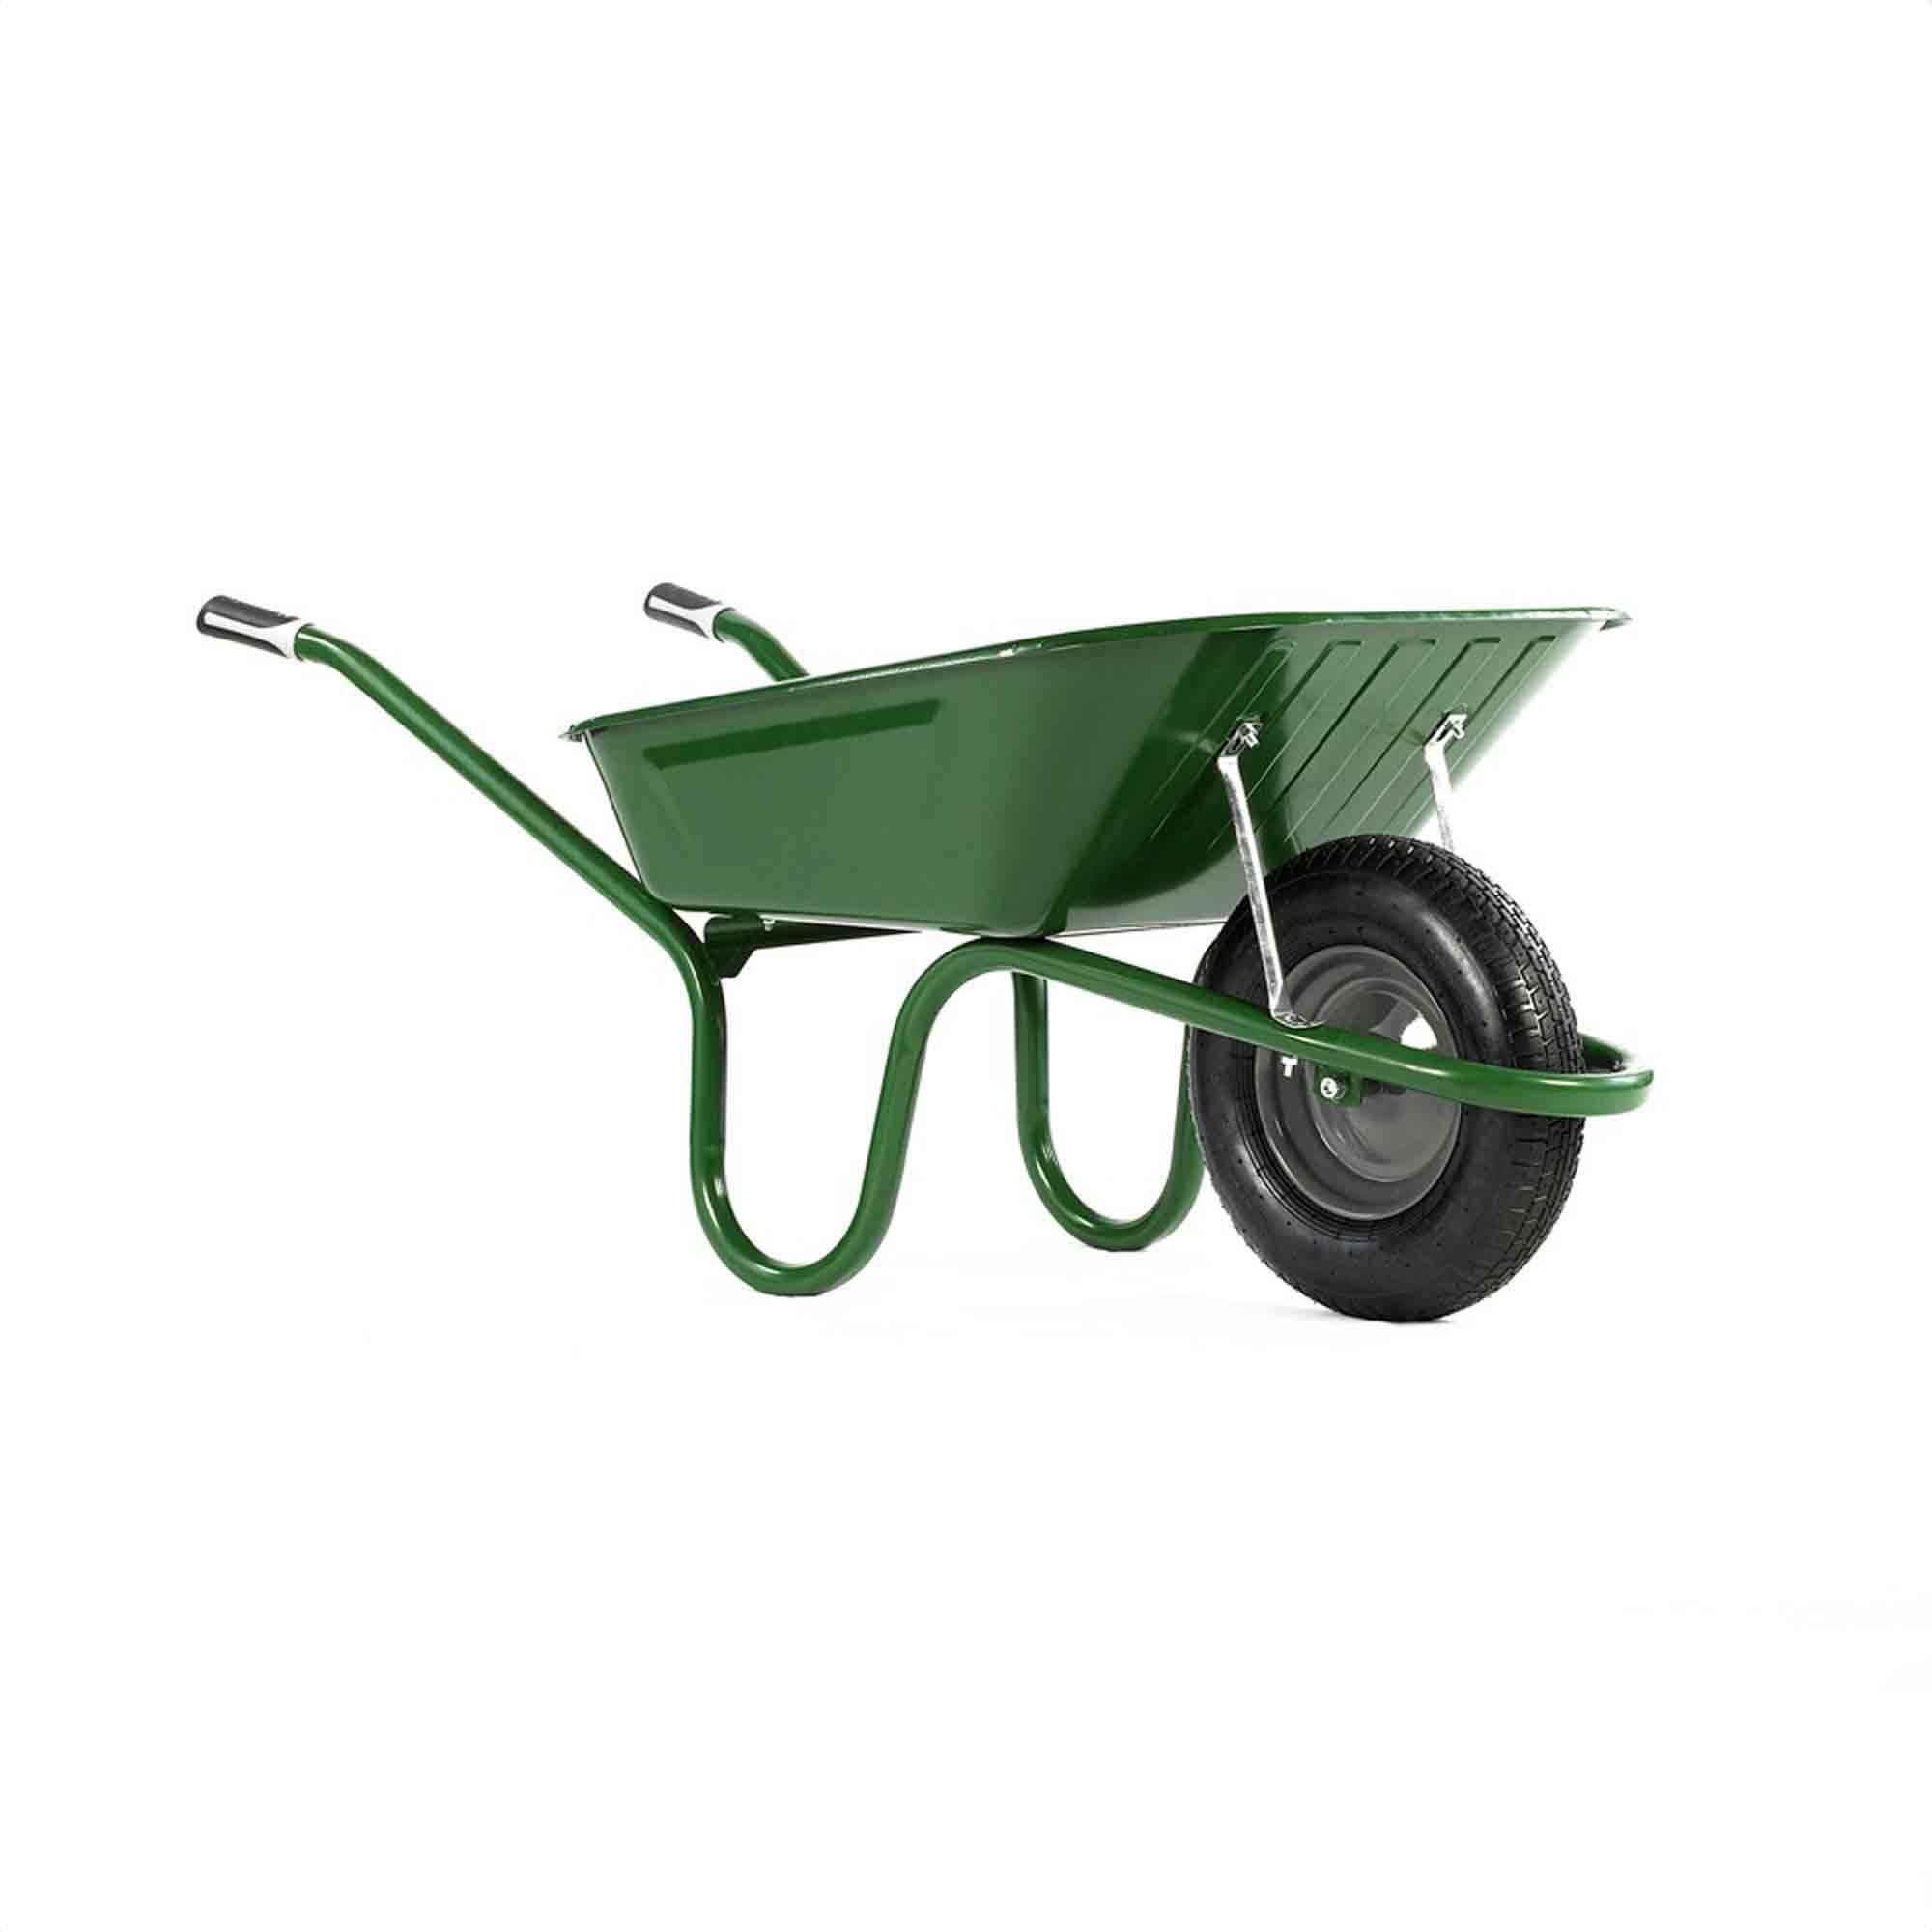 Haemmerlin 1041 Original Green Wheel Barrow 90LT  (Pueumatic)